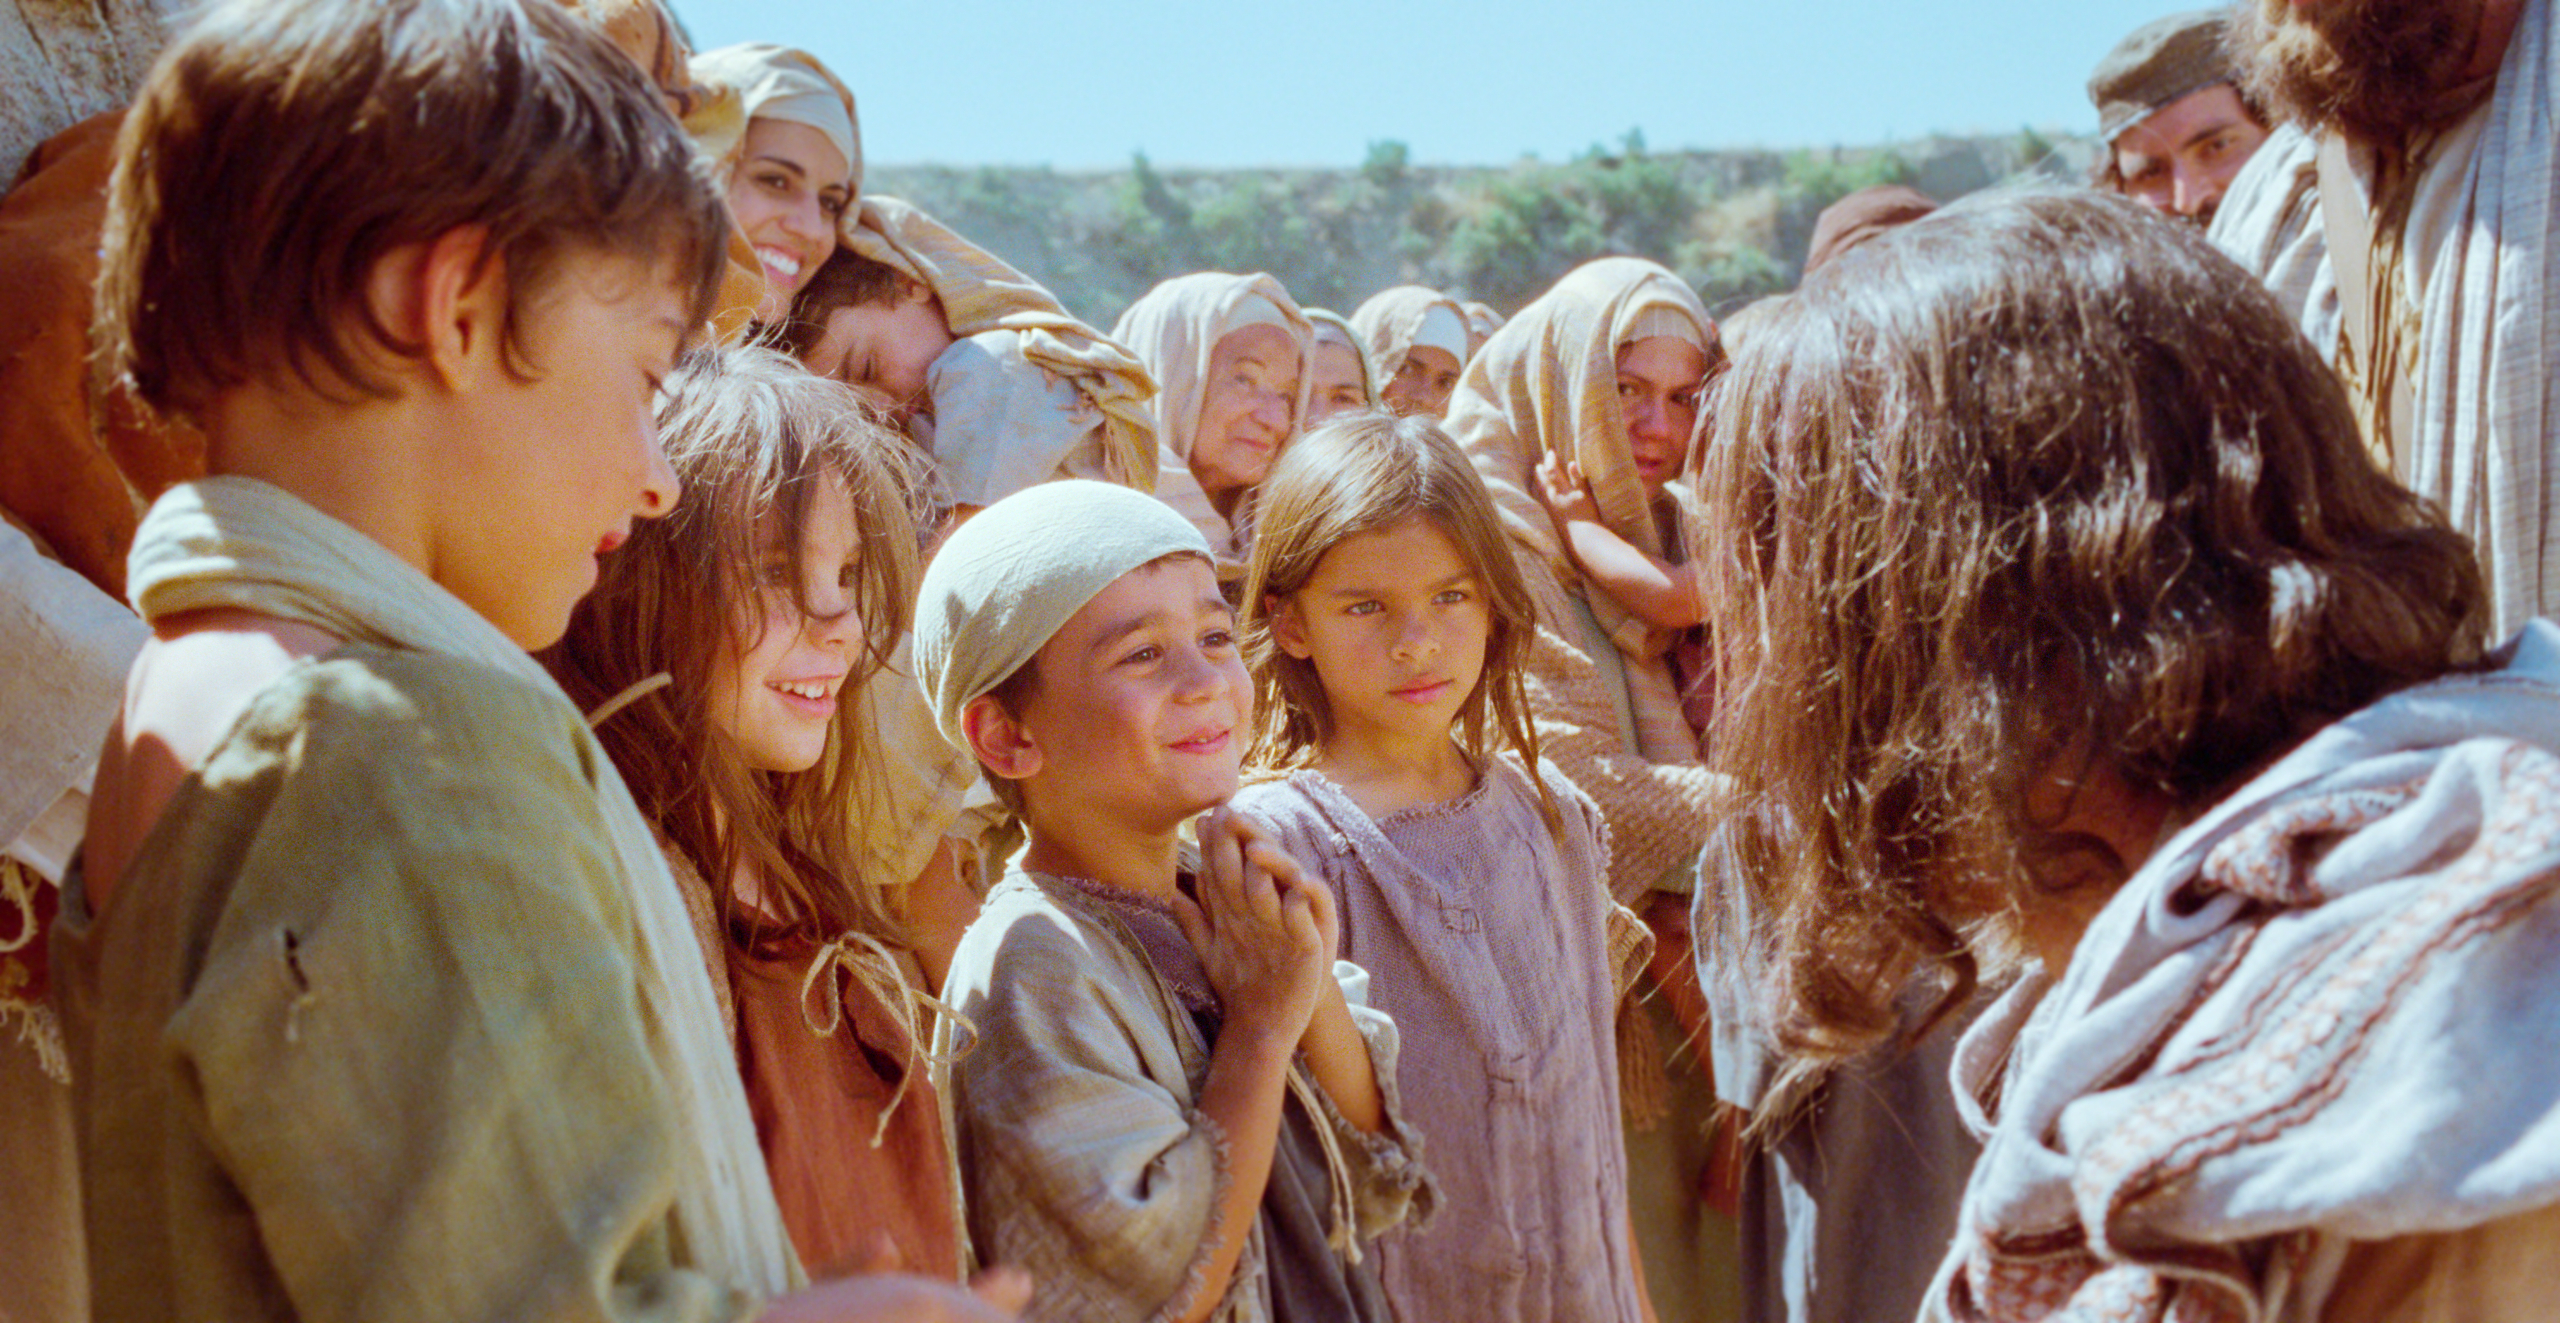 jesus speaks to the little children lds clipart jesus healing lds clipart jesus in gethsemane